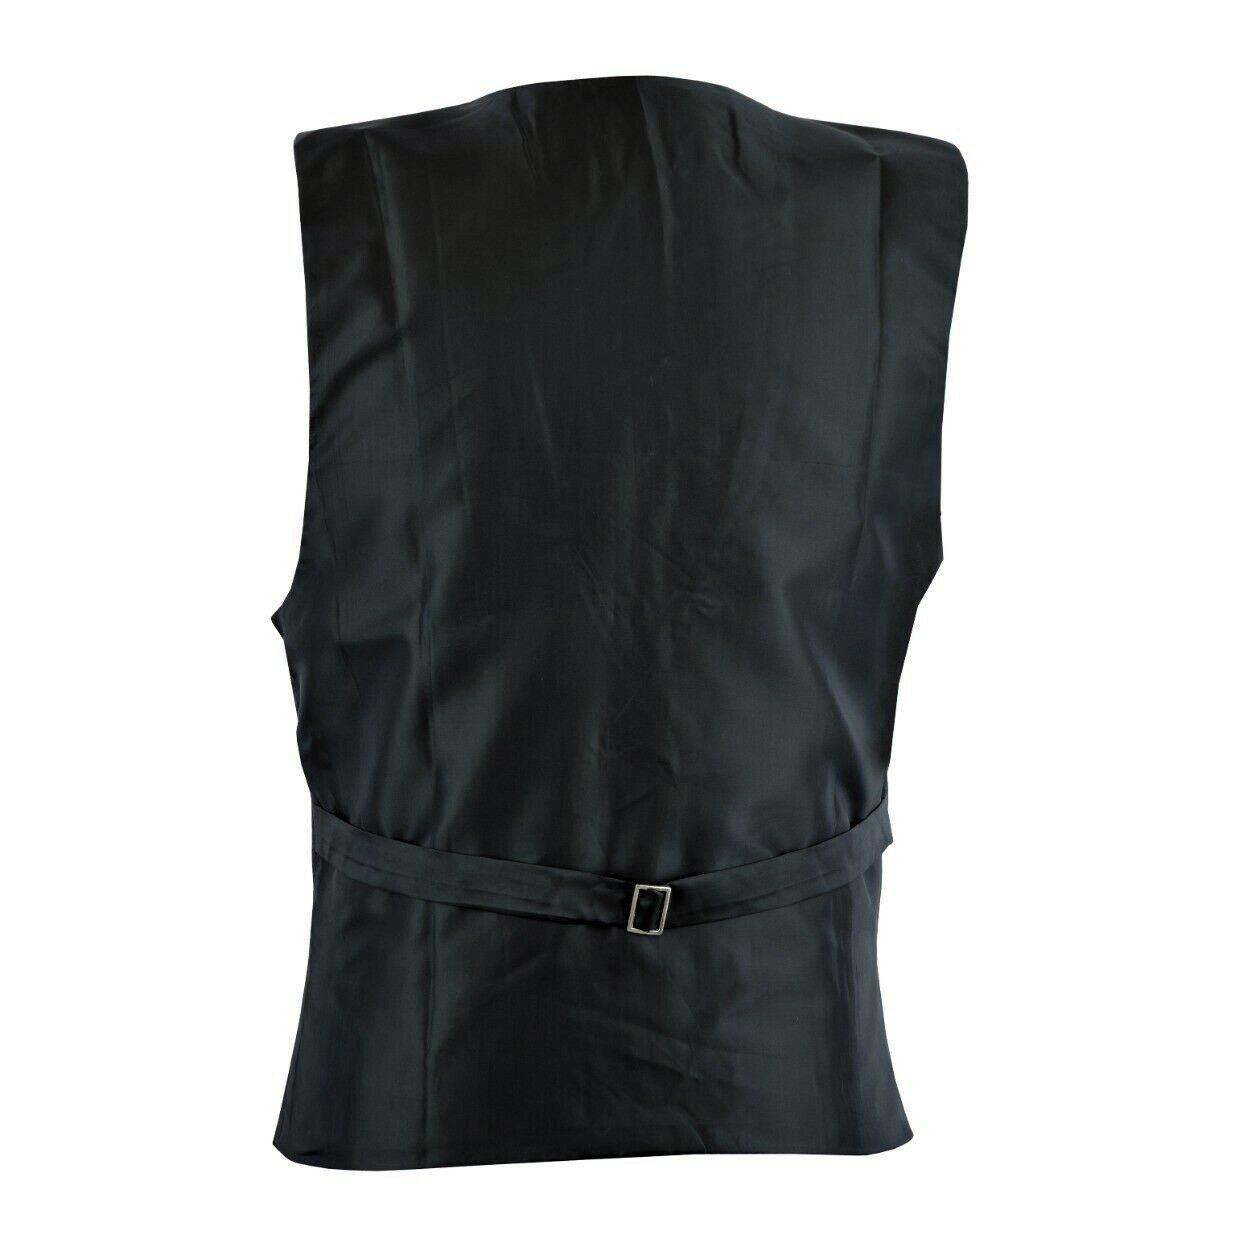 DARKROCK Victorian Single Breasted Brocade Vest Regency Waistcoat (1)